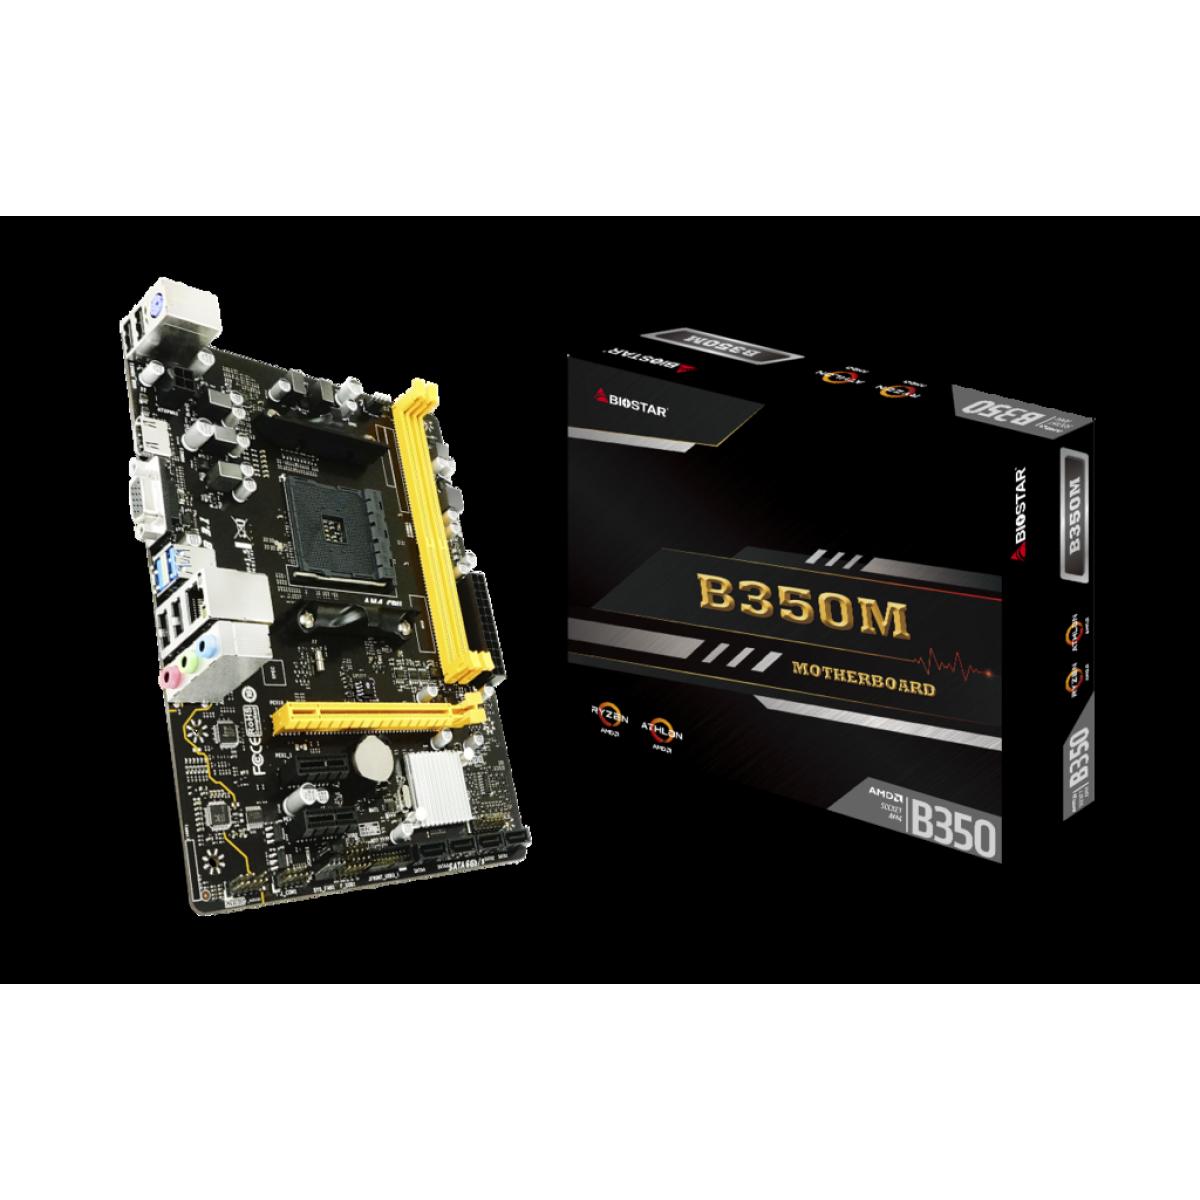 Placa Mãe Biostar B350M, Chipset B350, AMD AM4, mATX, DDR4